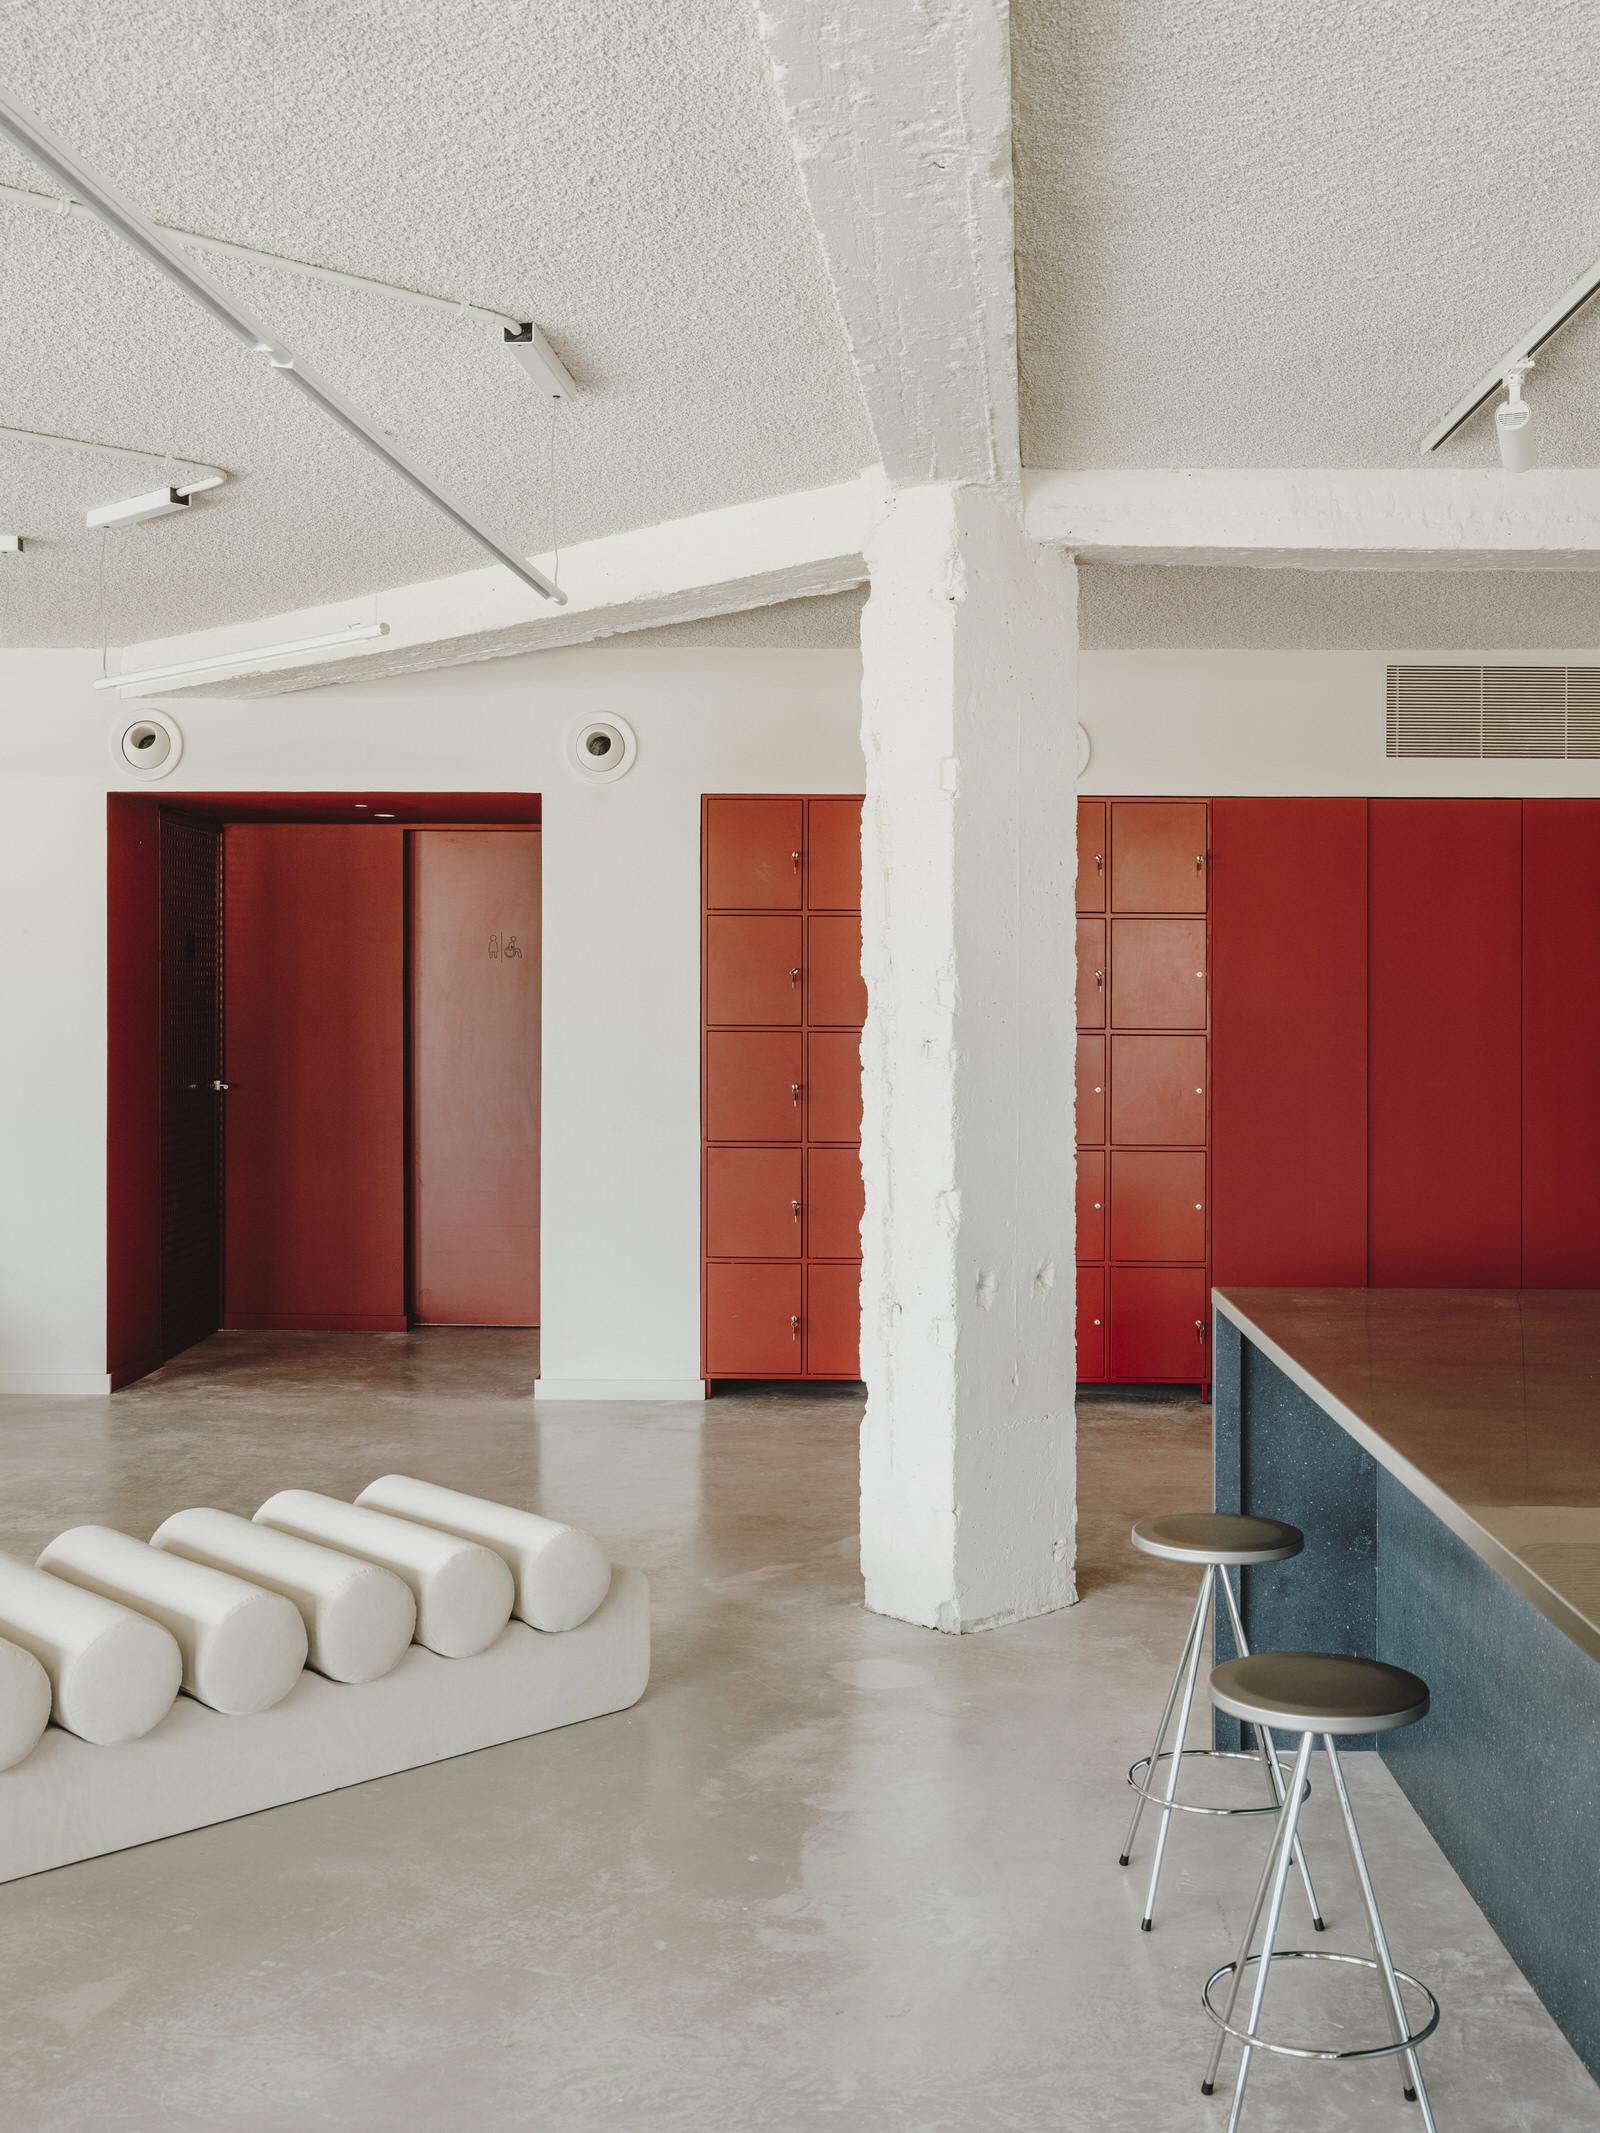 Mesura Architecture Design Cloudworks Penthouse Office Barcelona Photo Salva Lopez Yellowtrace 10